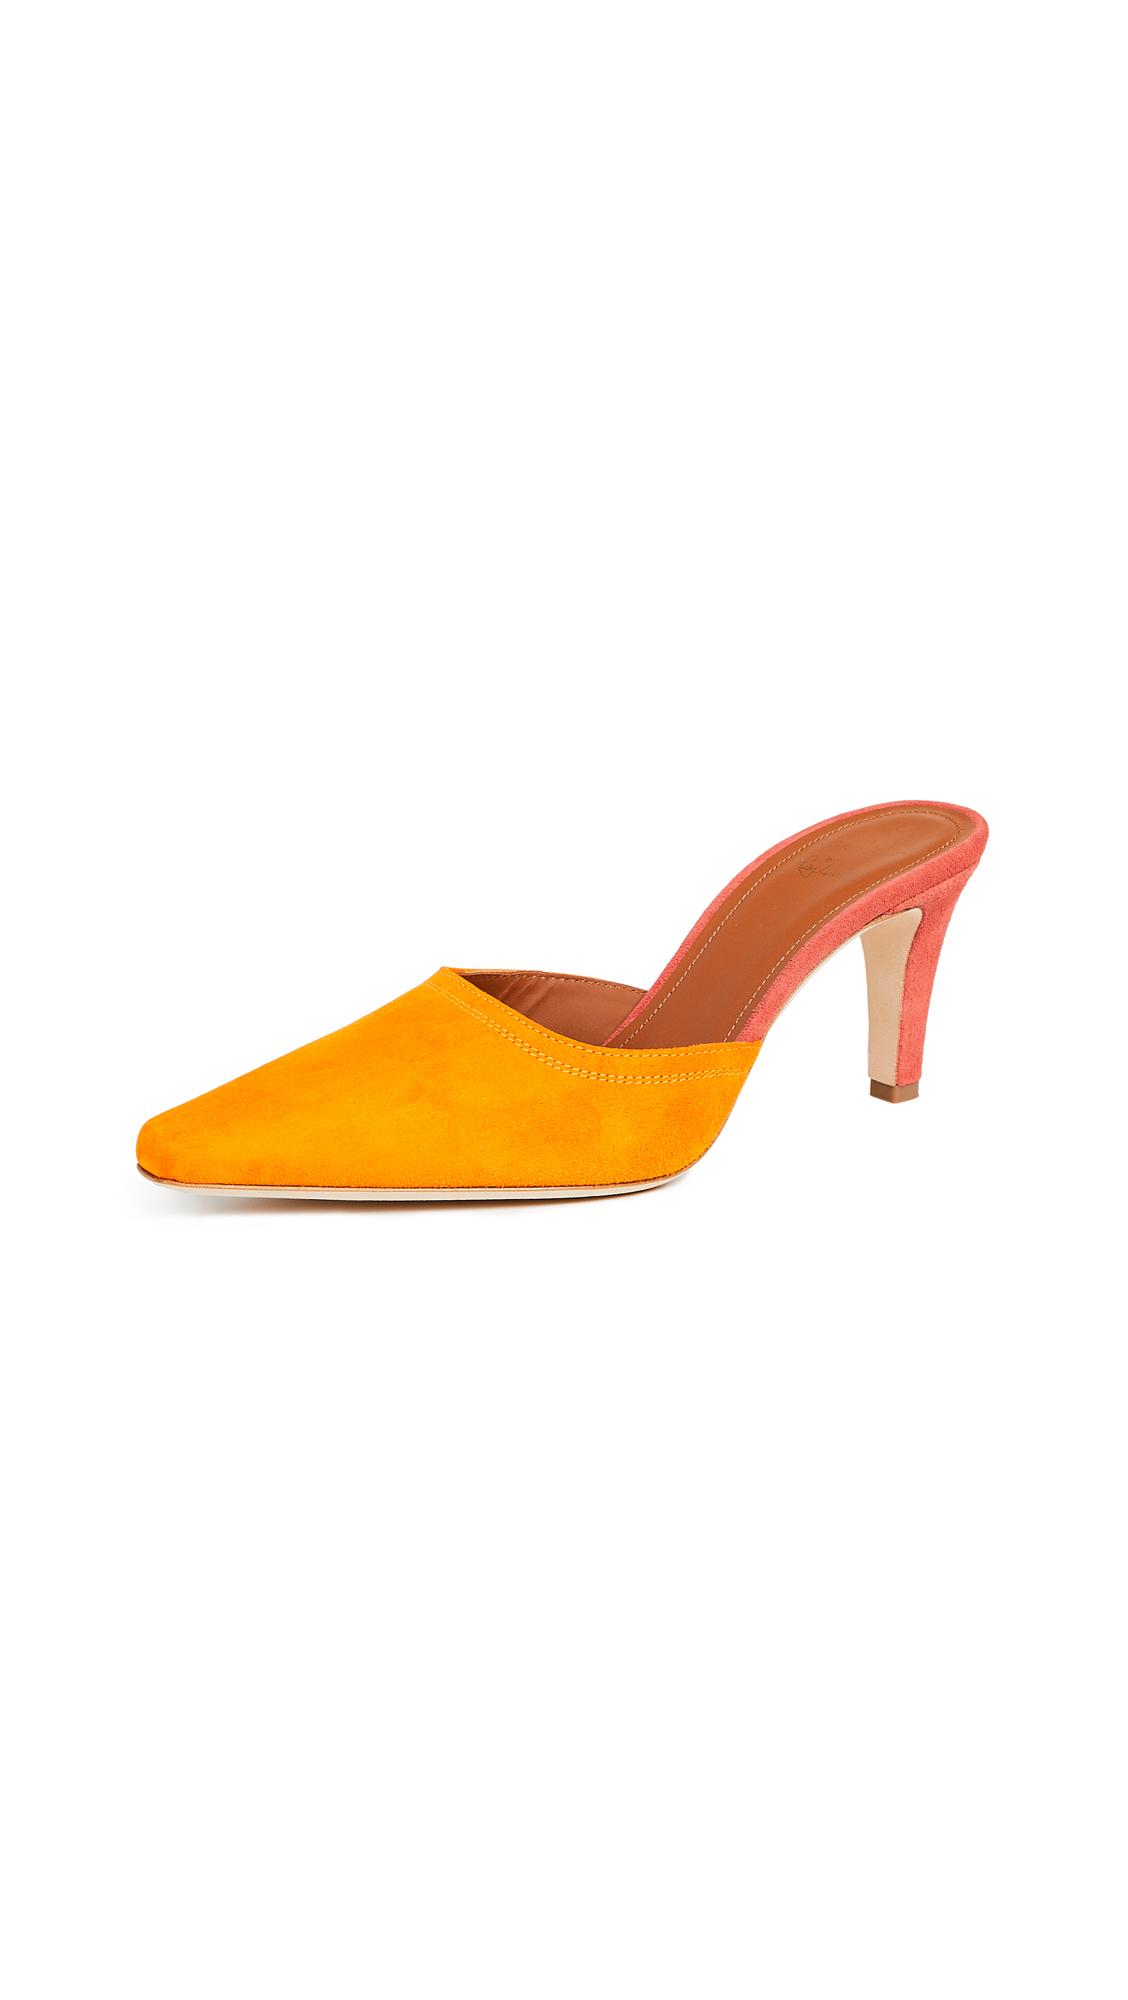 Malone Souliers by Roy Luwolt Riona Roksanda Mules - Orange/Grapefruit